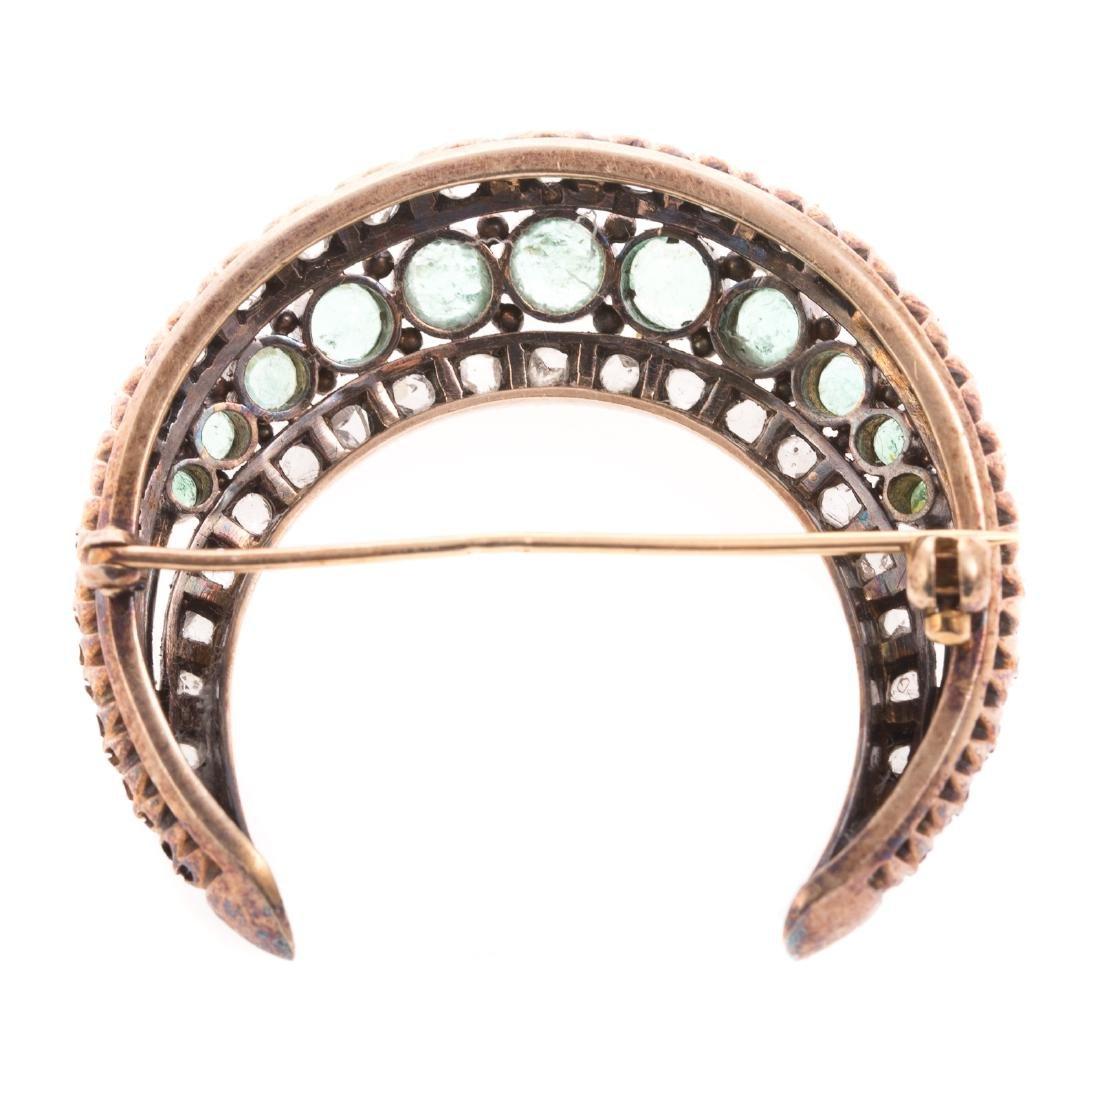 An Edwardian Emerald & Diamond Crescent Moon Pin - 5